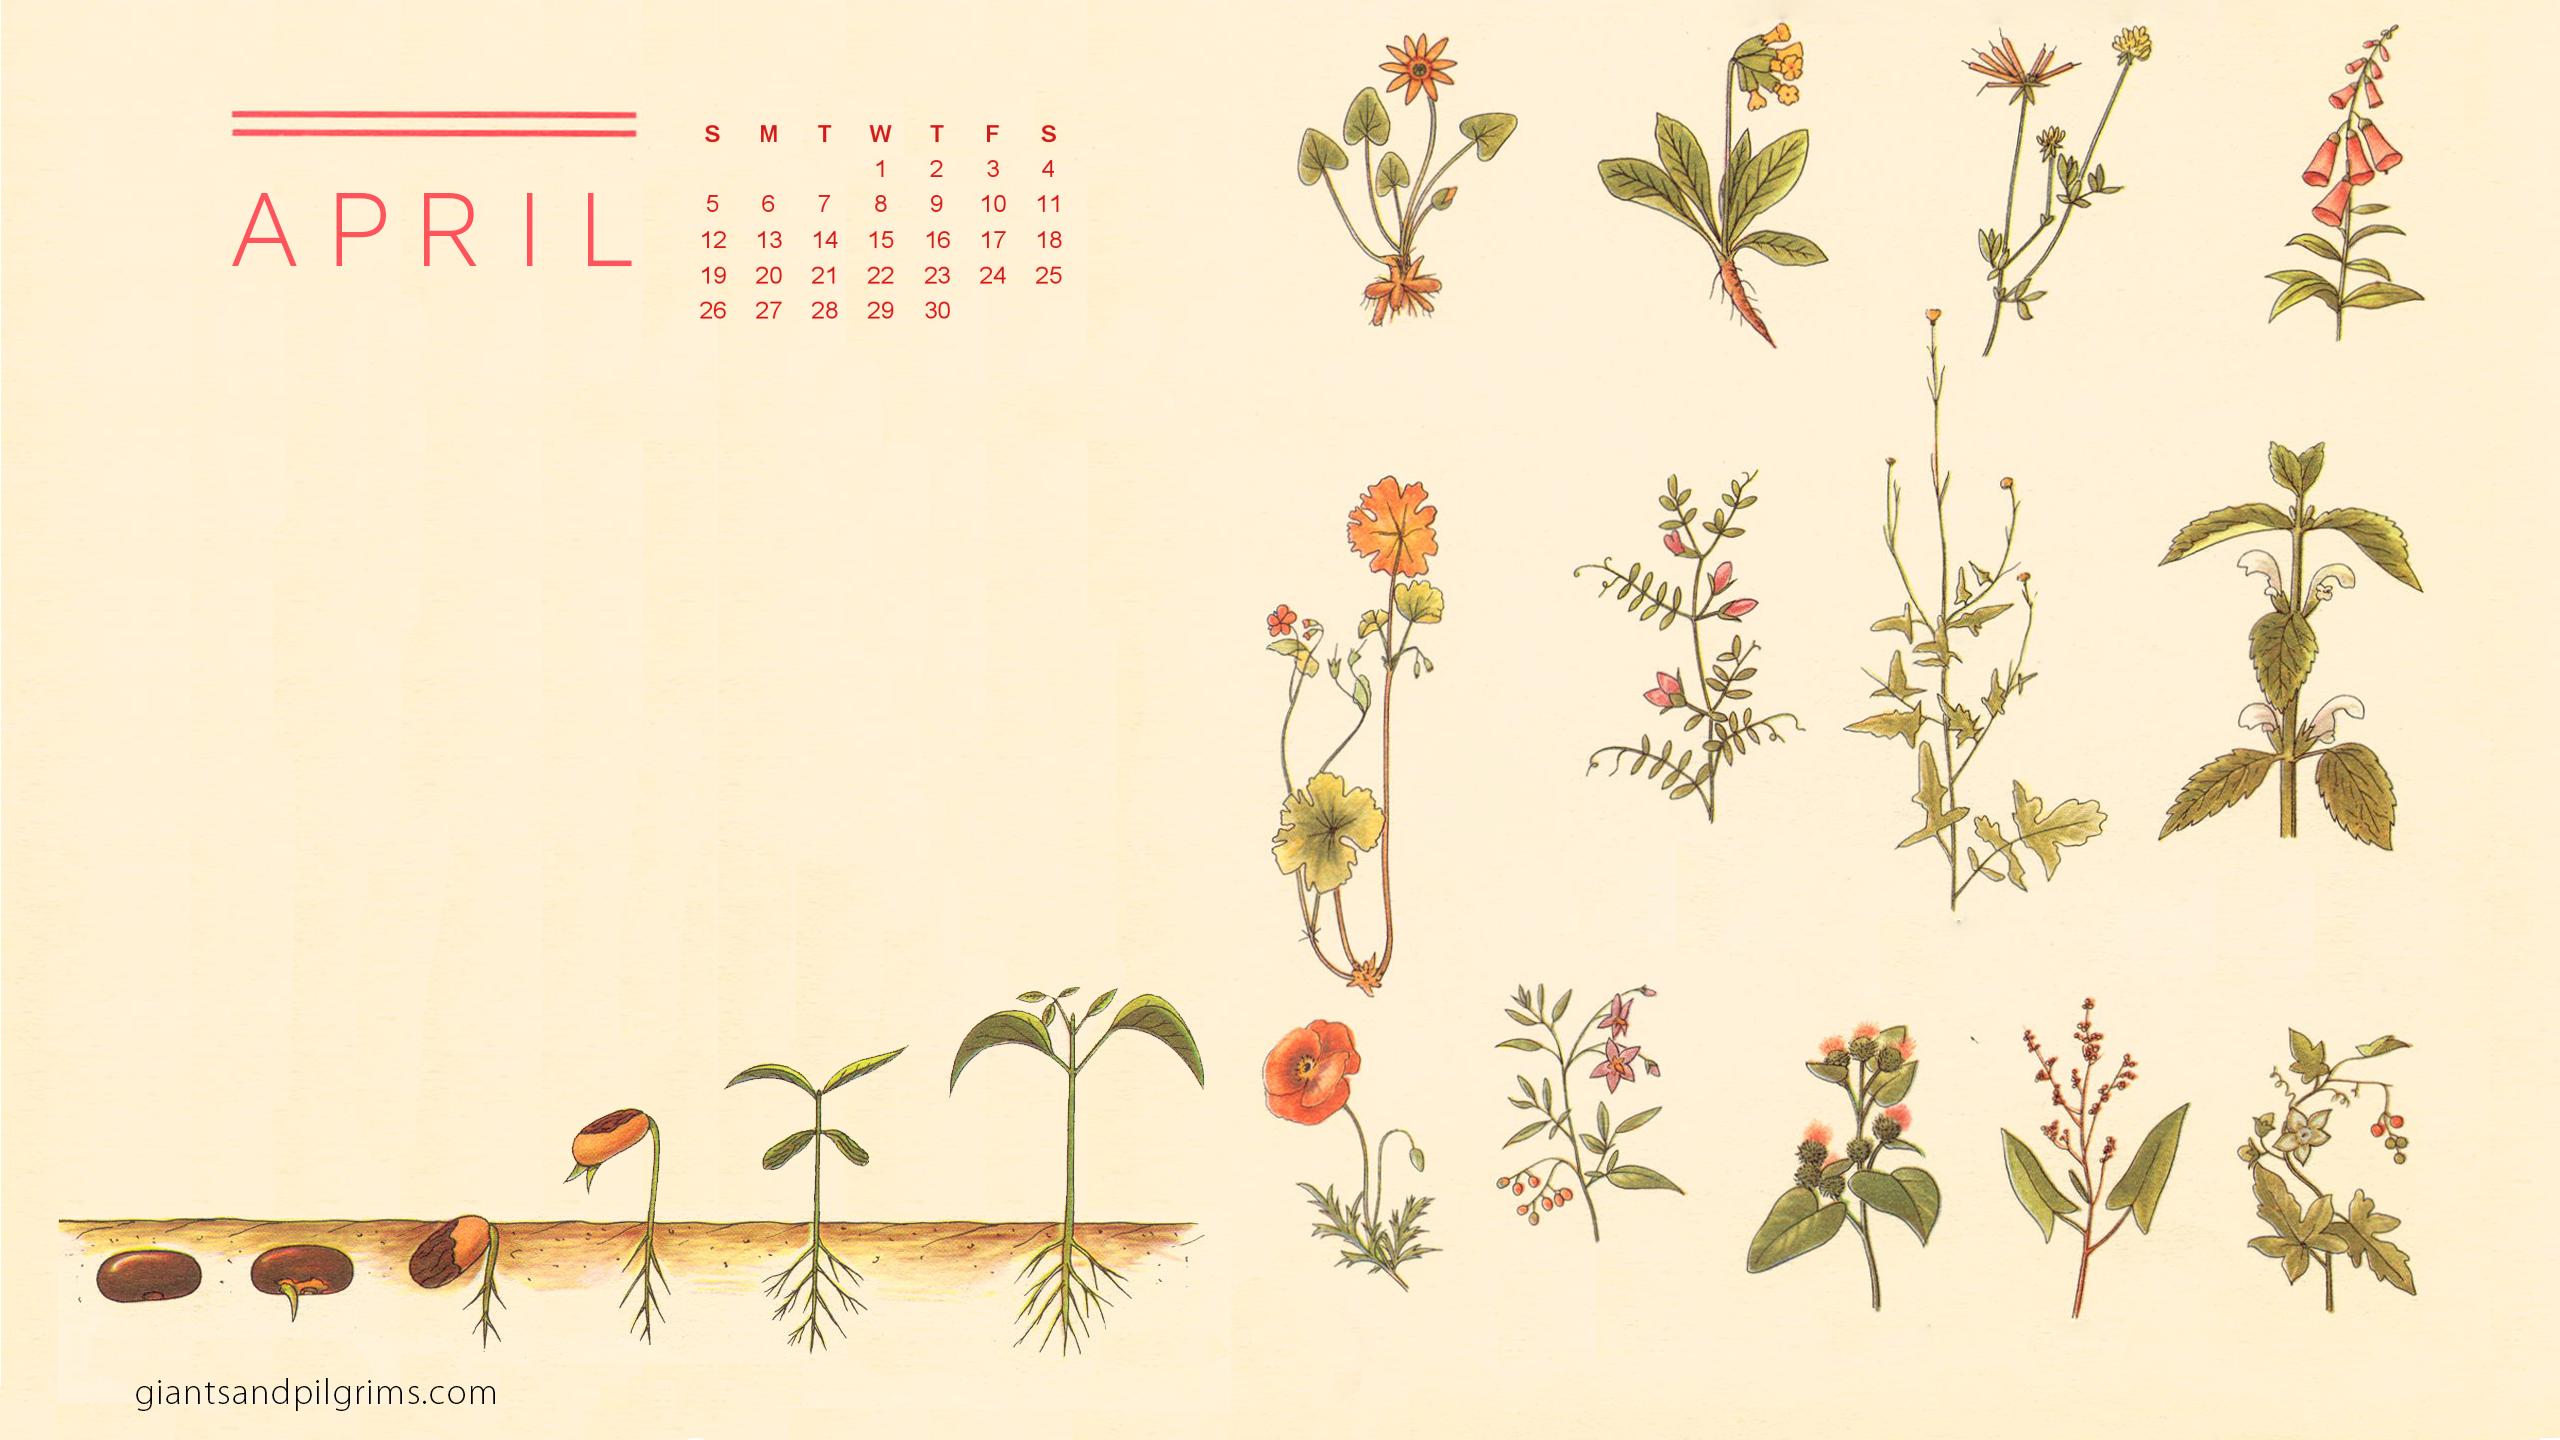 April 2015 Desktop and iPhone Wallpaper Giants Pilgrims 2560x1440